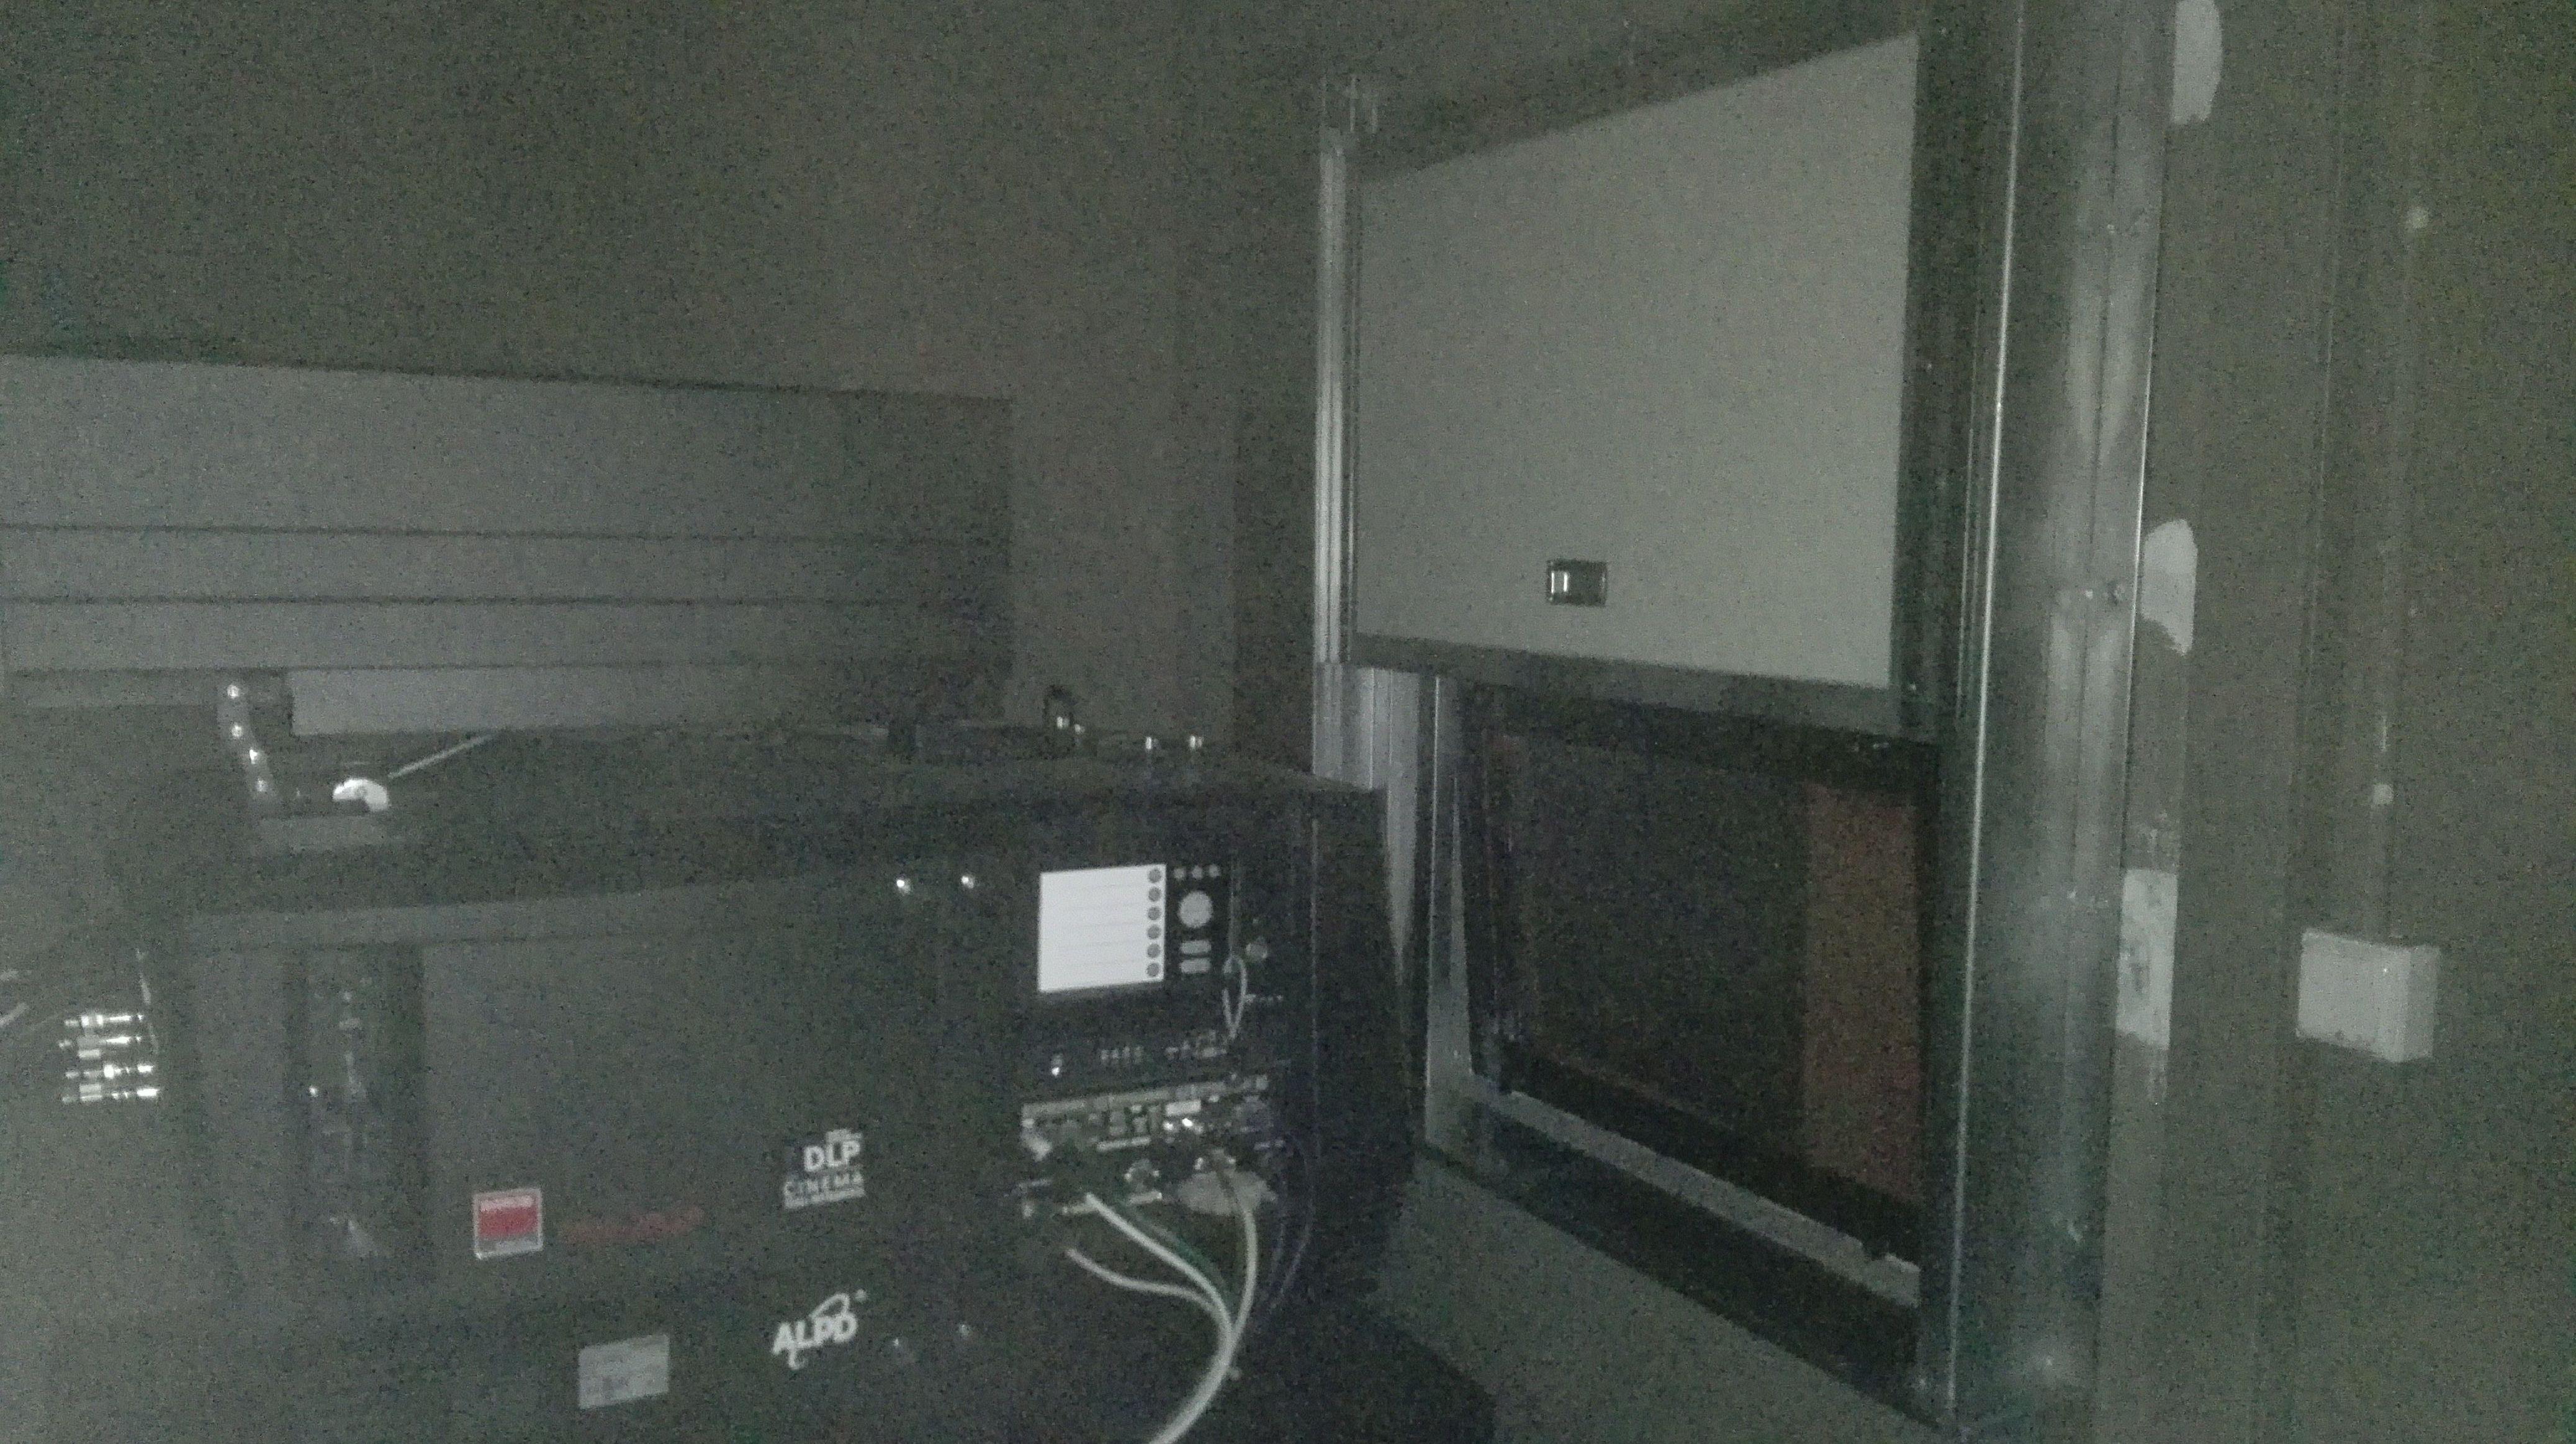 Puerta cortafuegos guillotina para ventana en sala proyector de cine